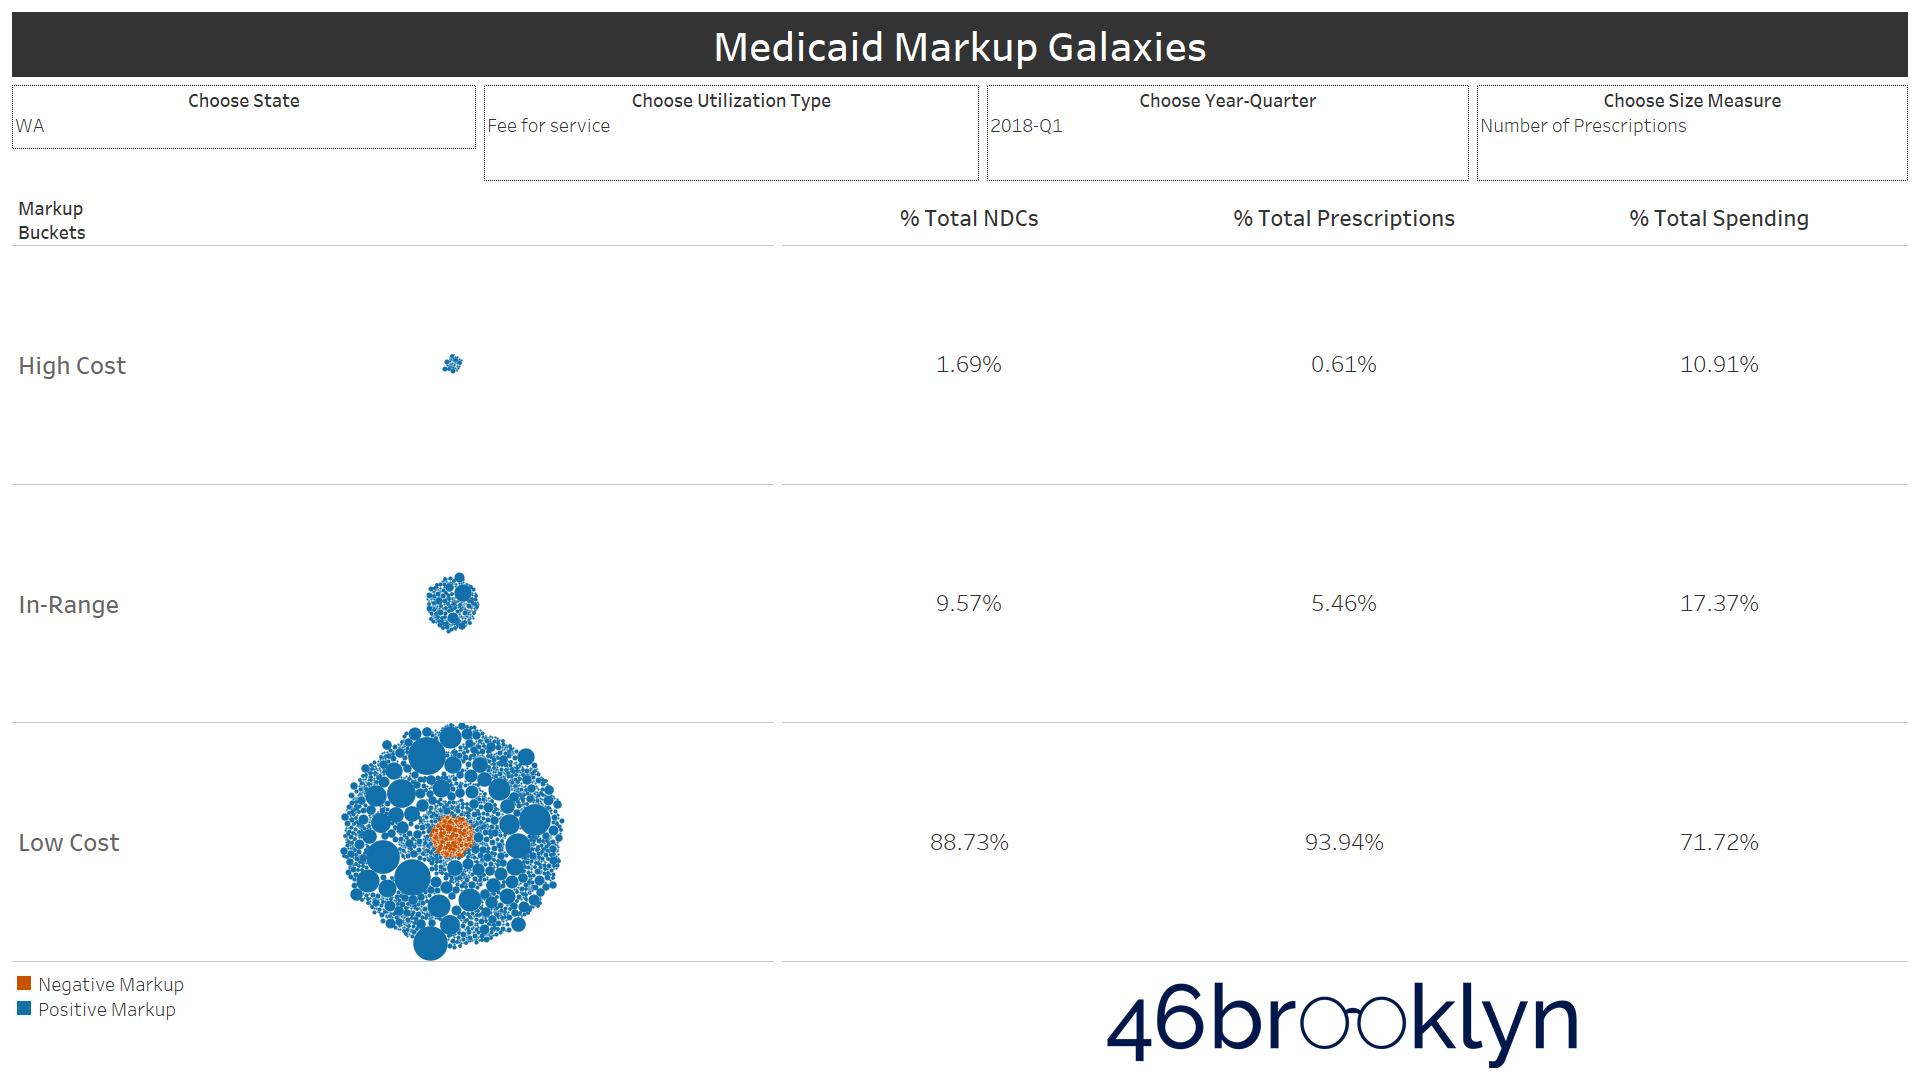 Figure 8   Source: Data.Medicaid.gov, 46brooklyn Research